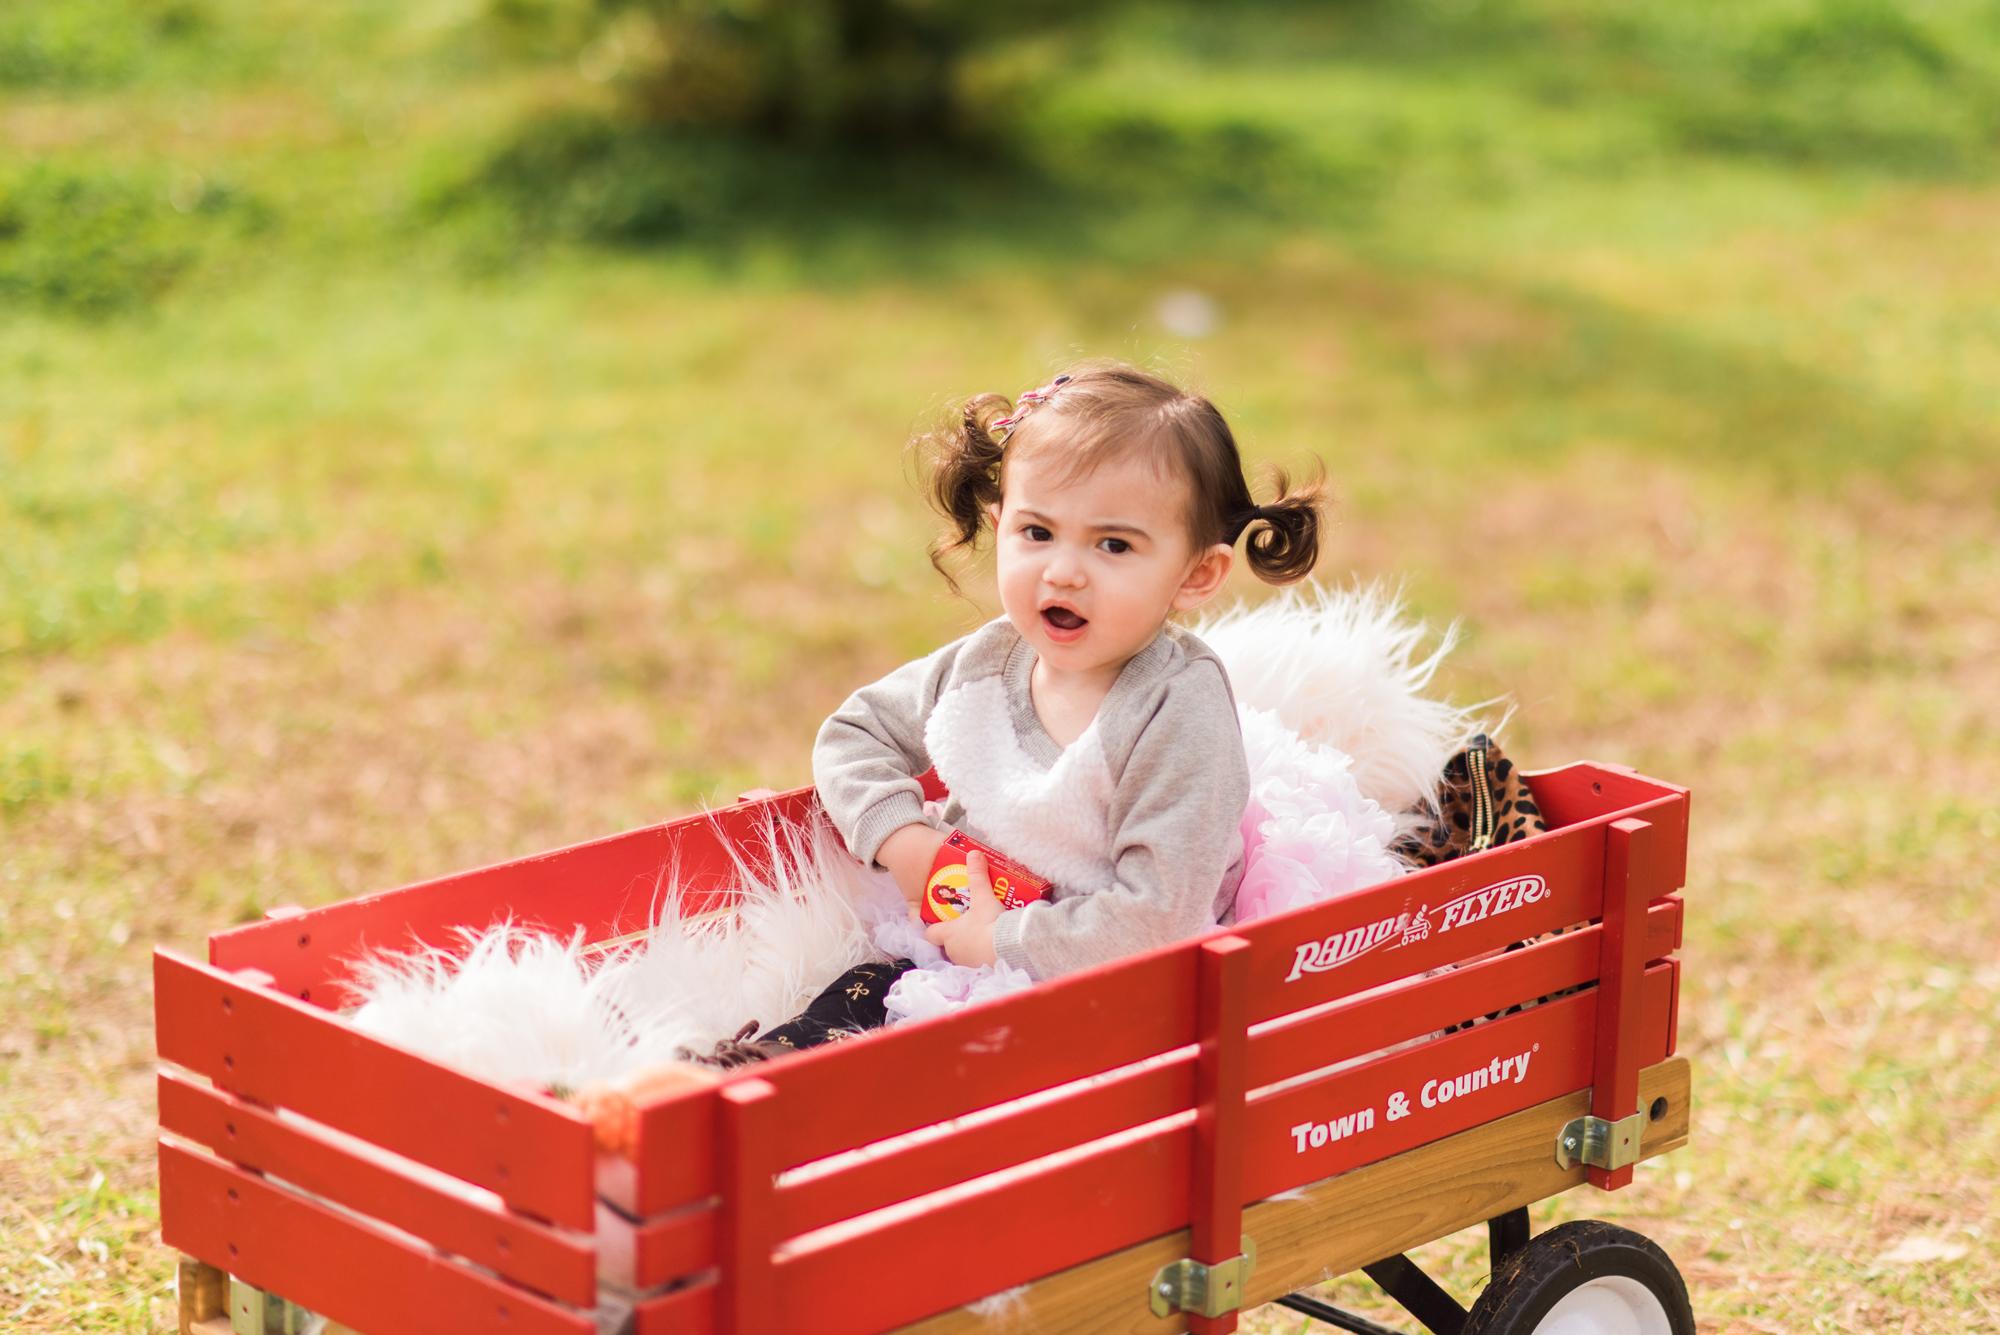 Holiday Family Photo Shoot - Scarlett out of raisins!